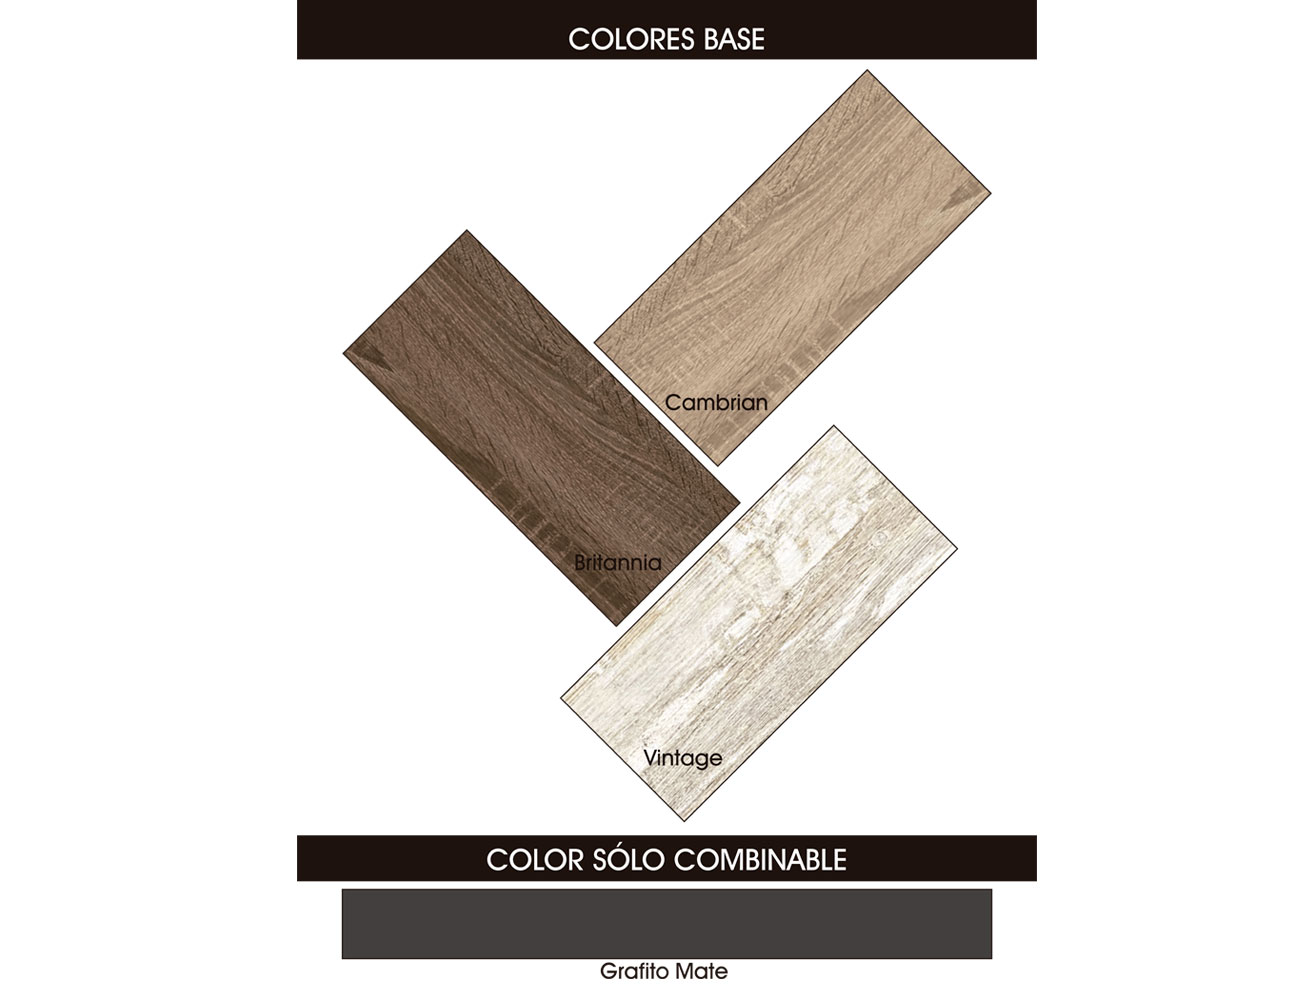 Colores 269